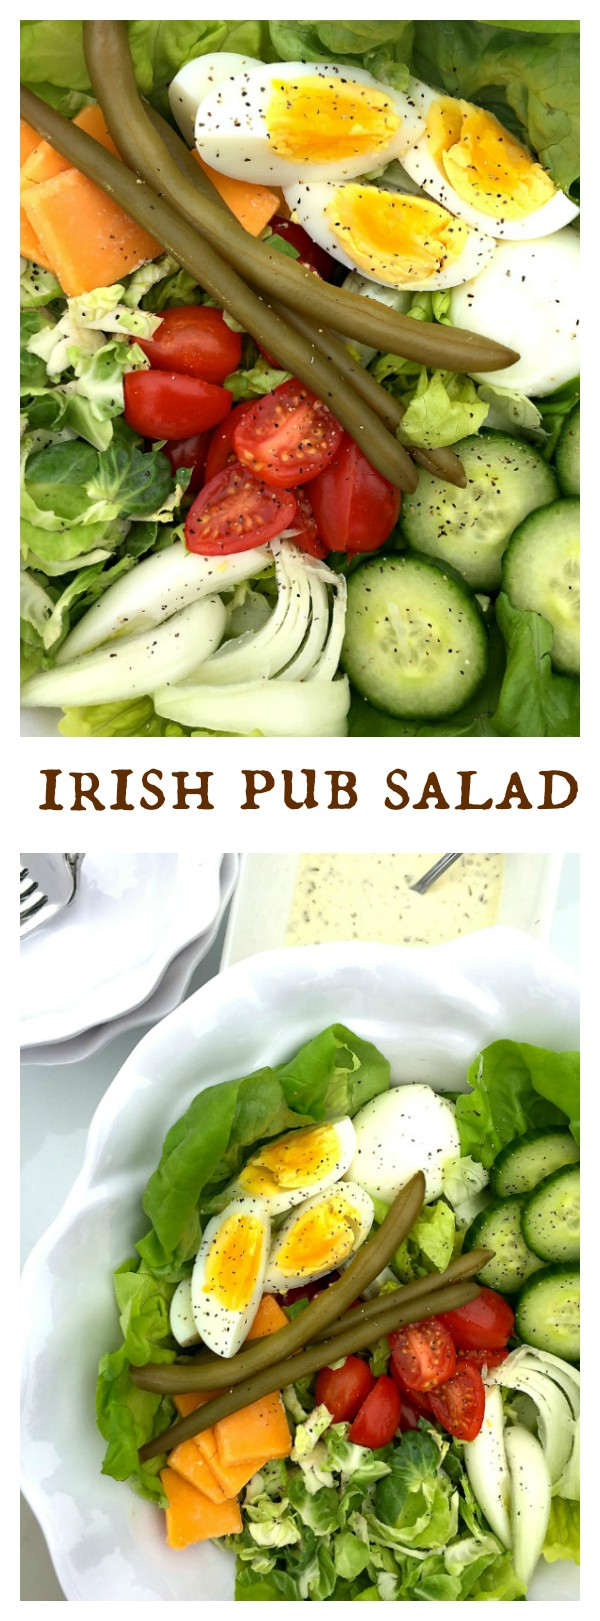 Irish Pub Salad for St. Patrick's Day